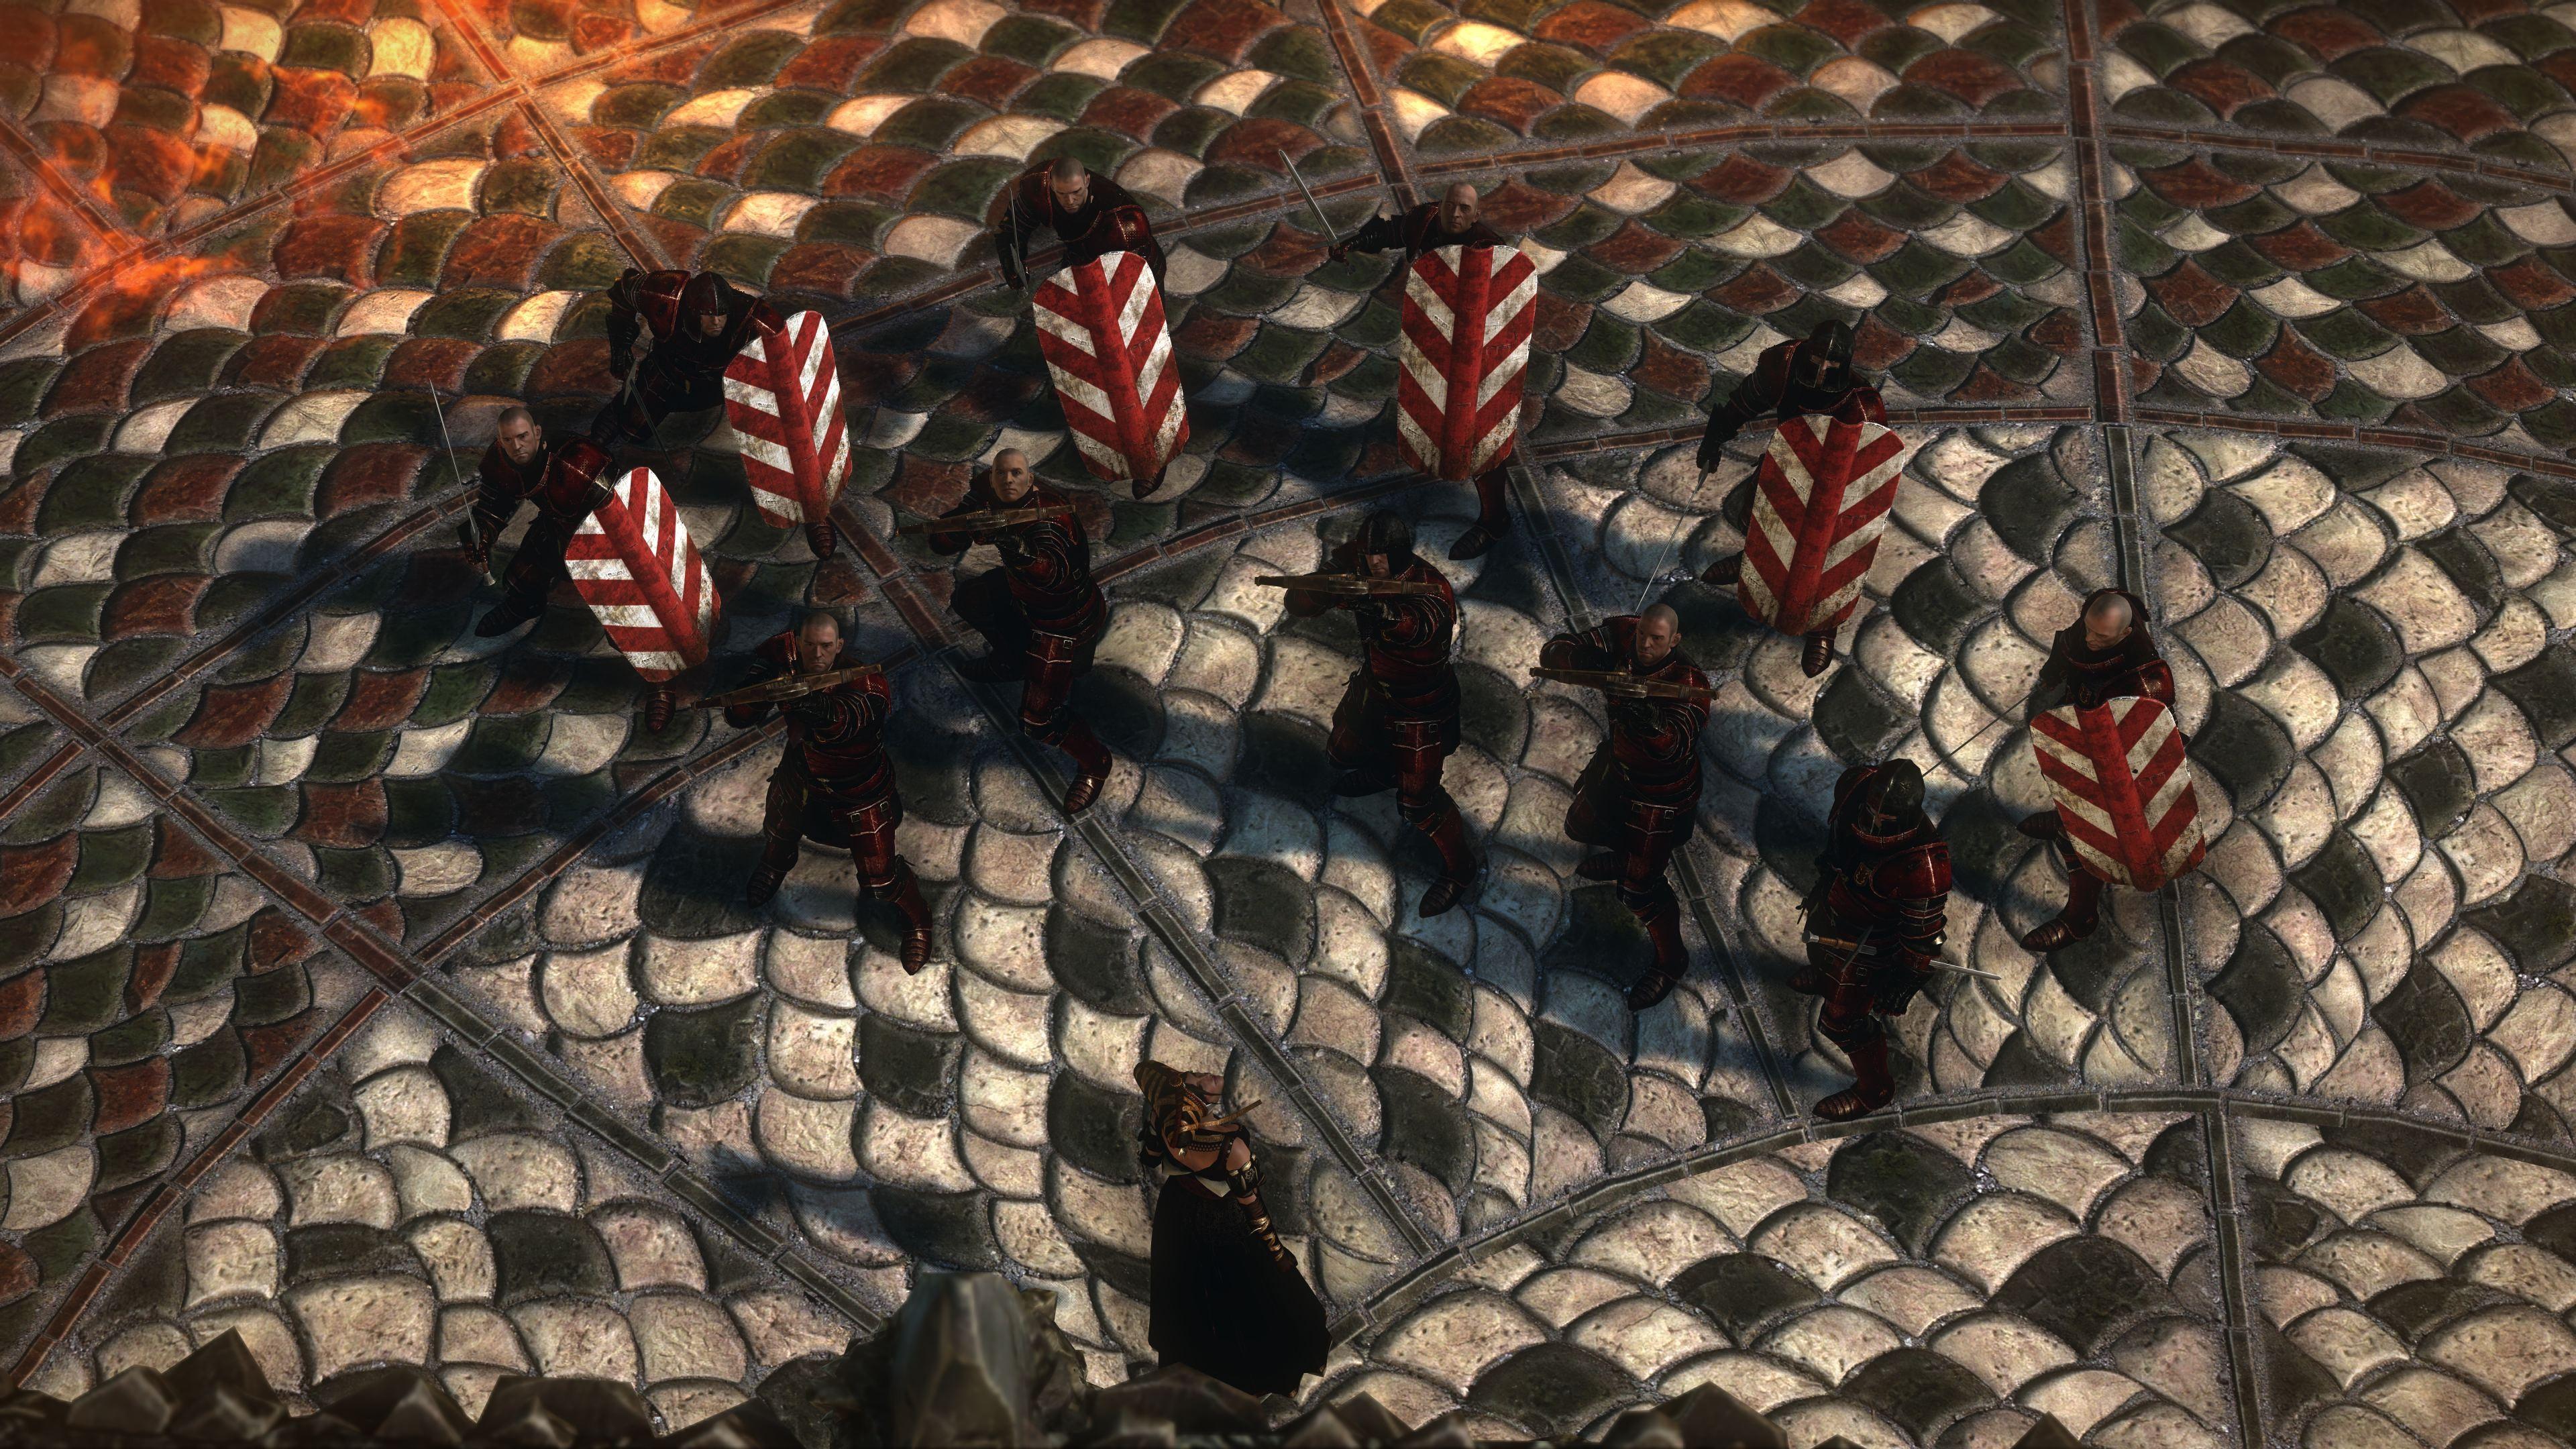 knights preparing for battle